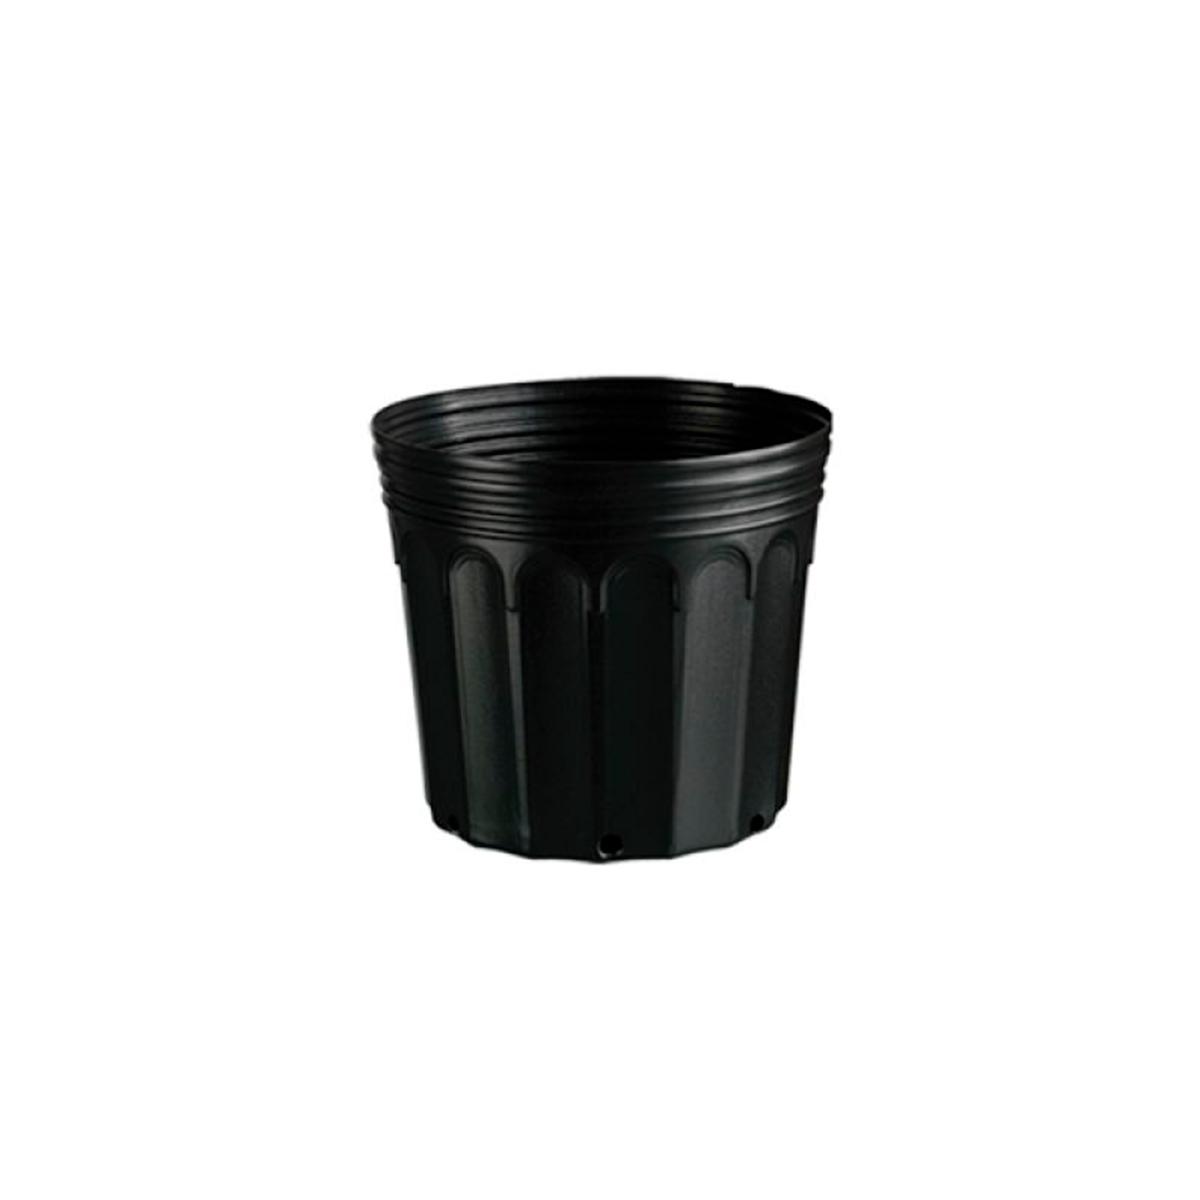 Kit 100 Embalagem Vaso para Mudas Plástico 3,6L